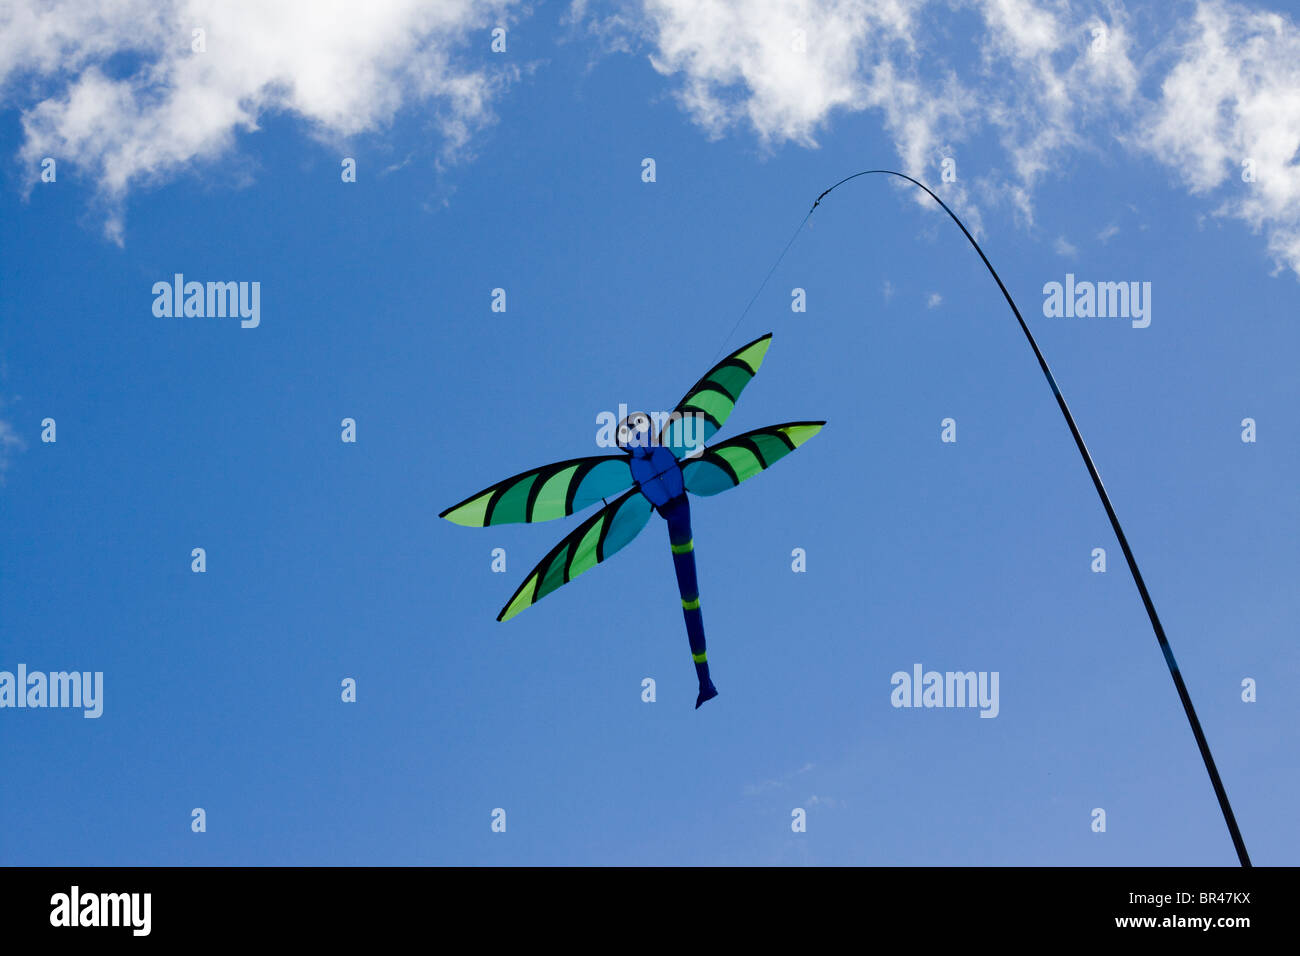 Dragonfly Decor Stock Photos & Dragonfly Decor Stock Images - Alamy